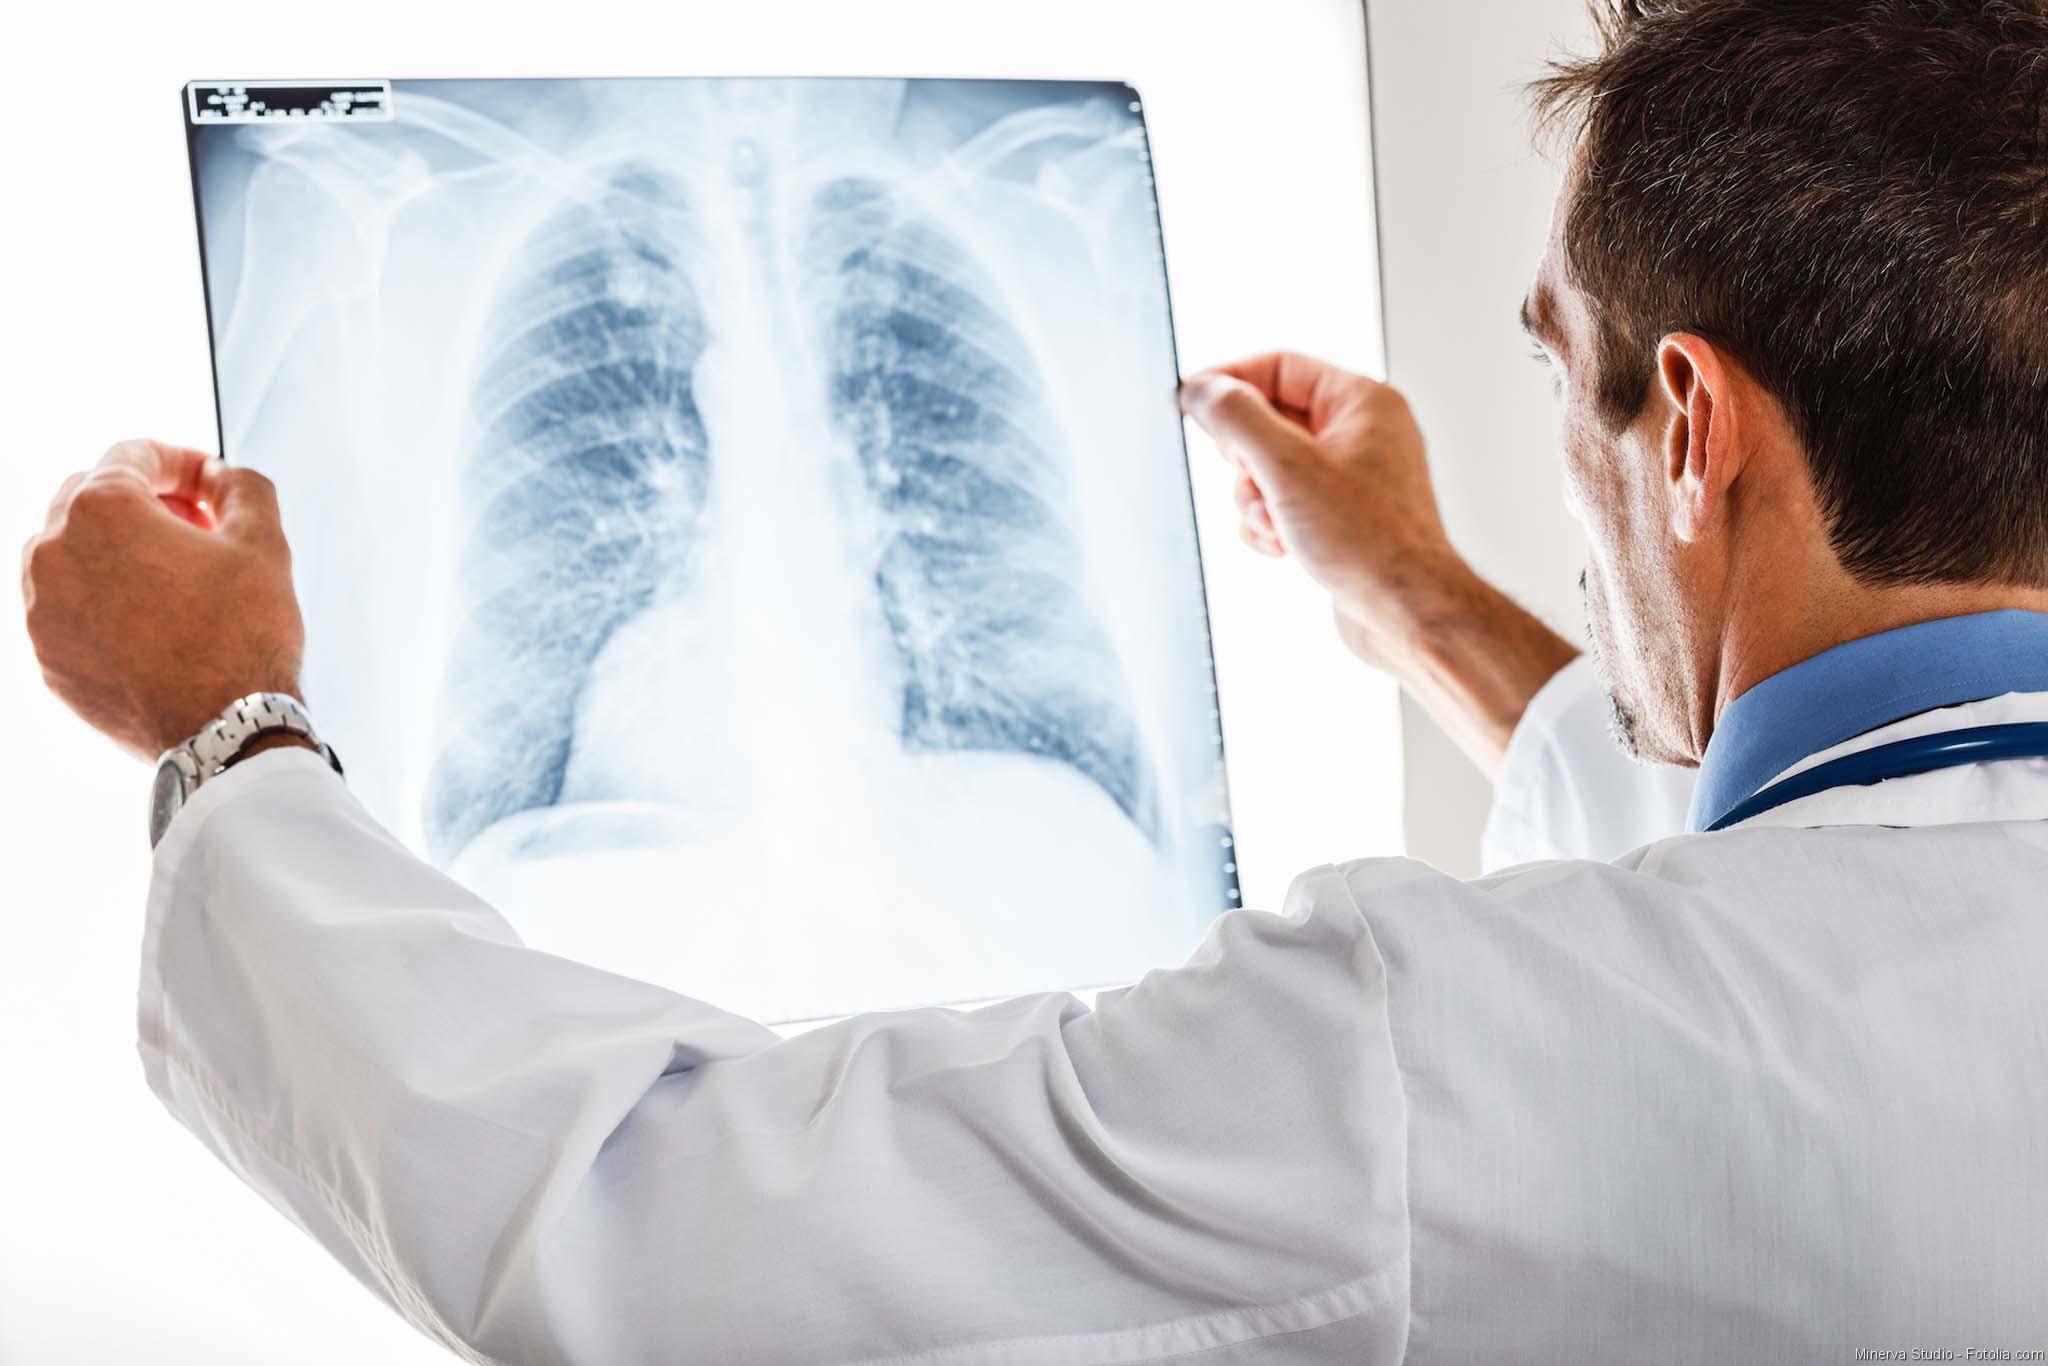 Mukoviszidose, Lungenkrebs, Lungenerkrankungen, Lunge, COPD, Lunenfibrose, Onkologie, Biosimilars, DGHO, Arzt, Patient